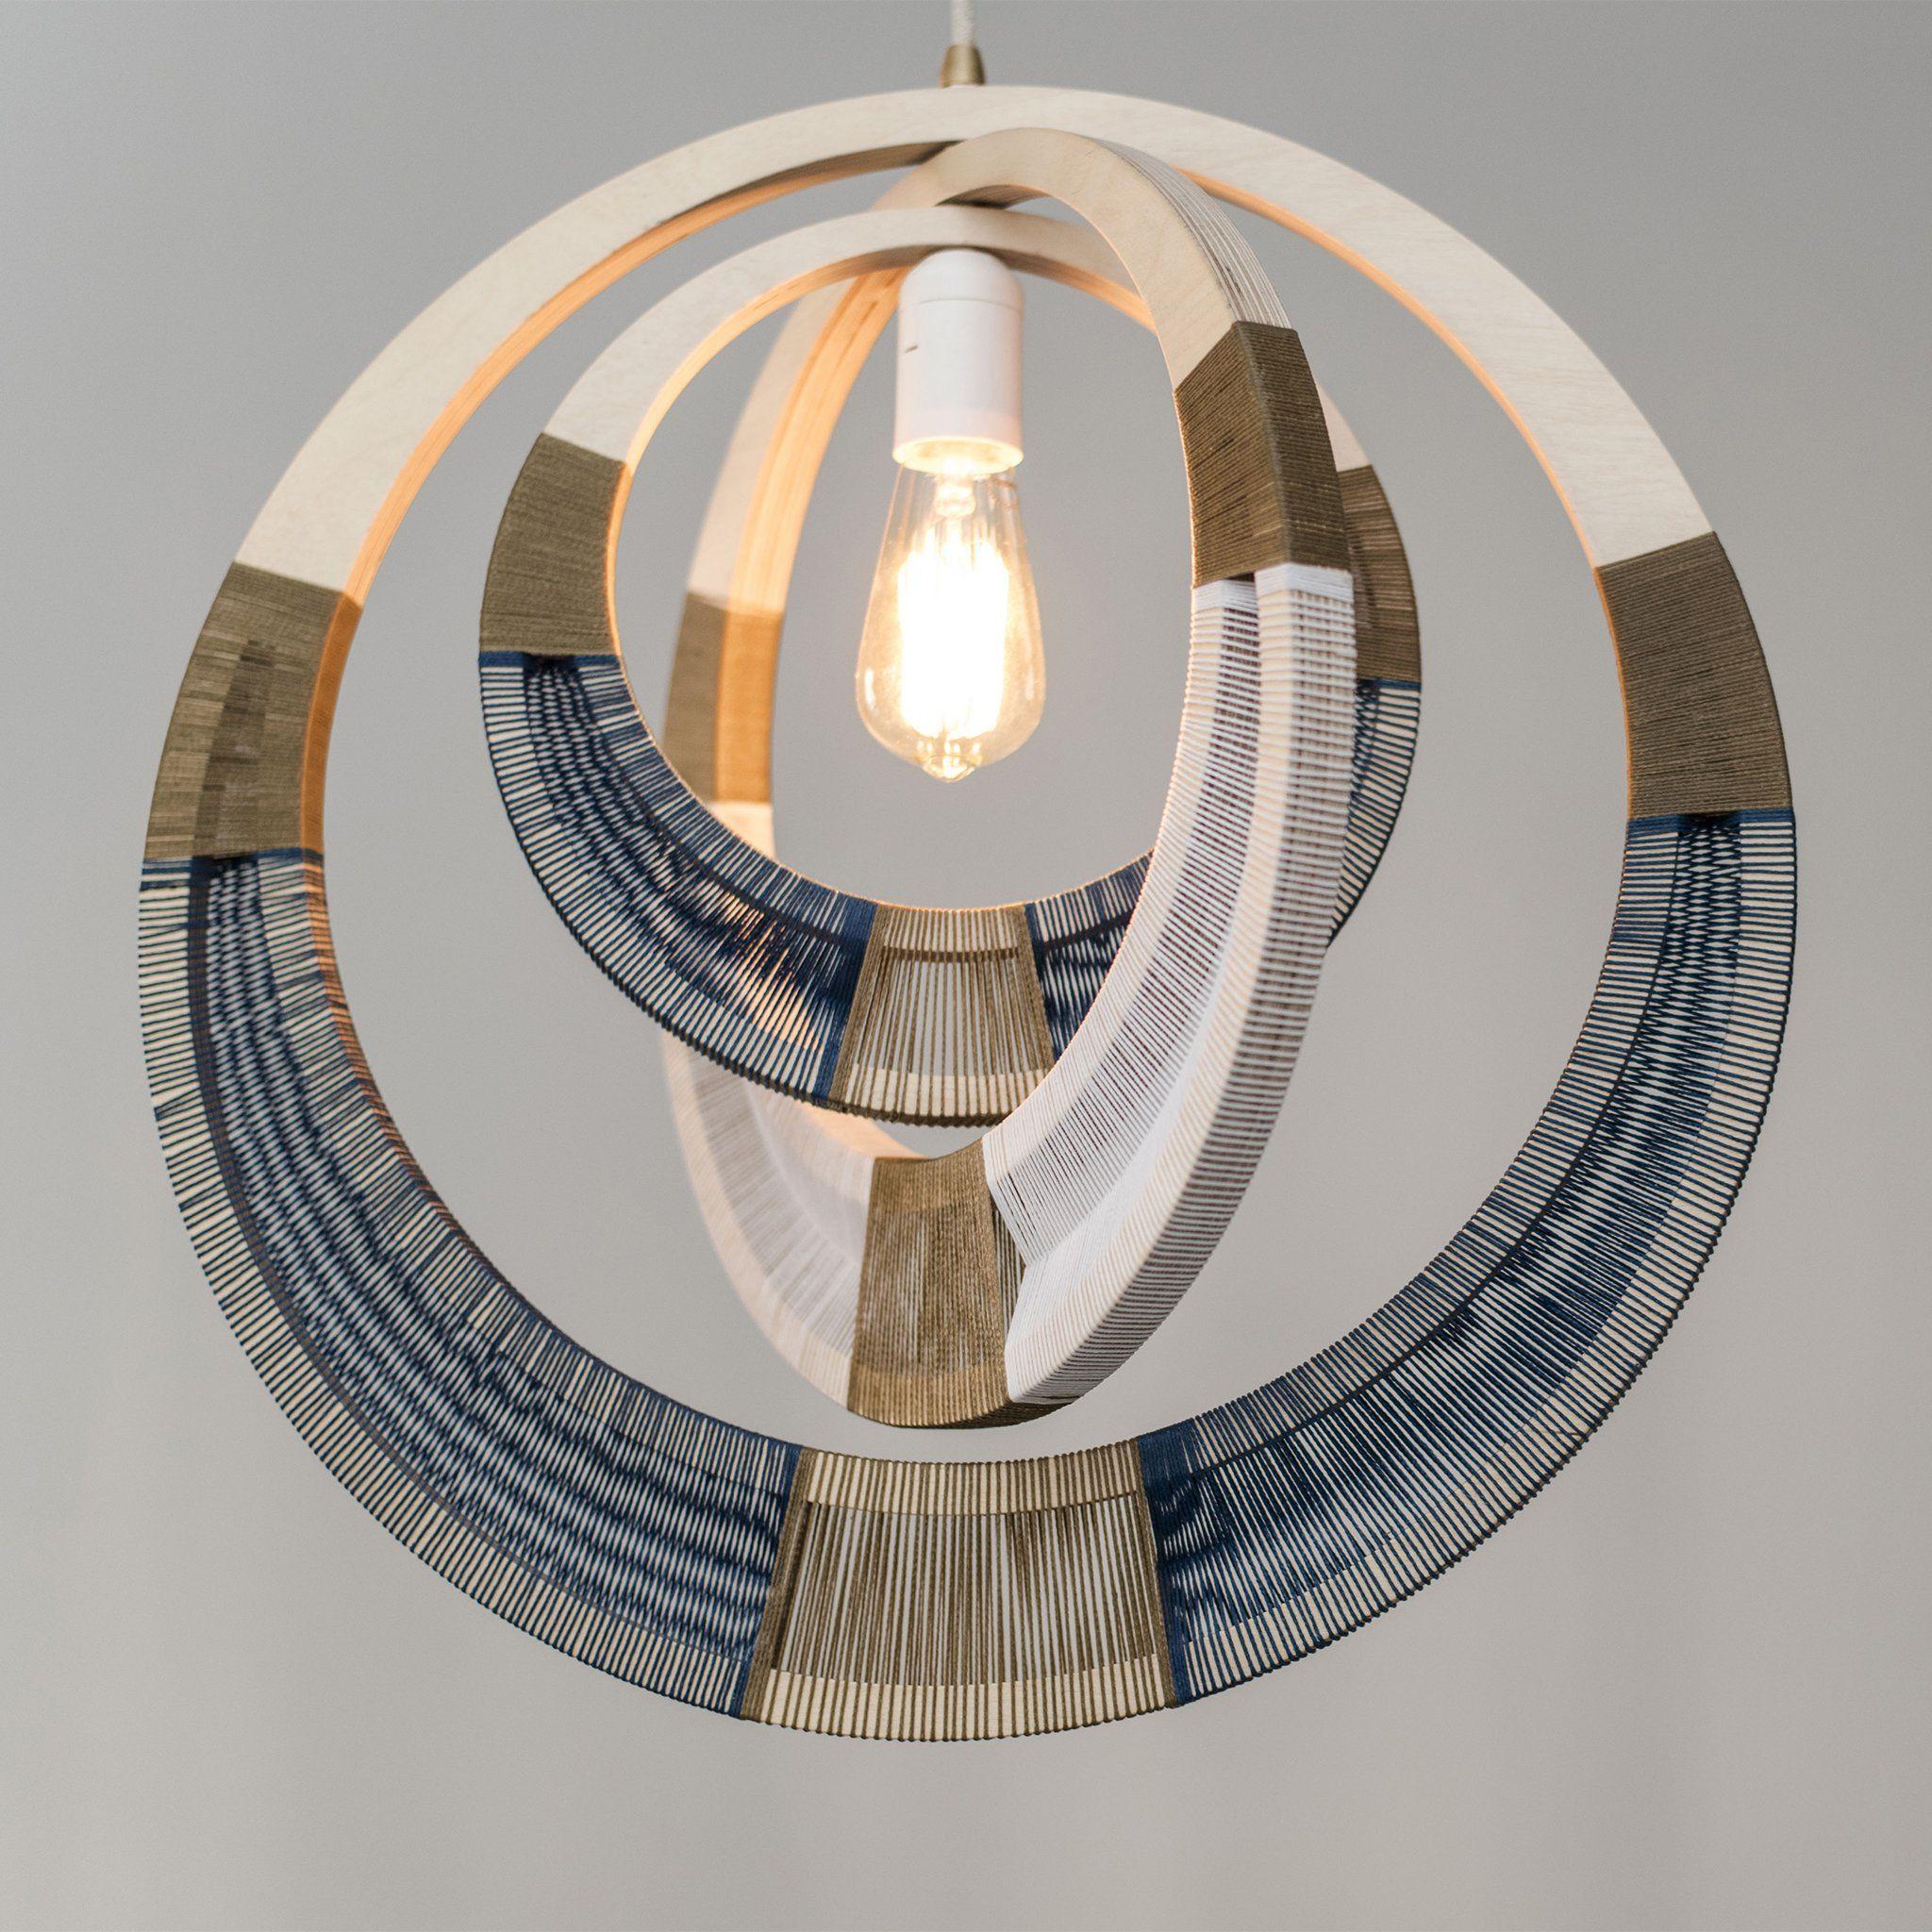 Woven Necklace Pendant Lighting Cobalt Pendant Lighting Contemporary Light Fixtures Light